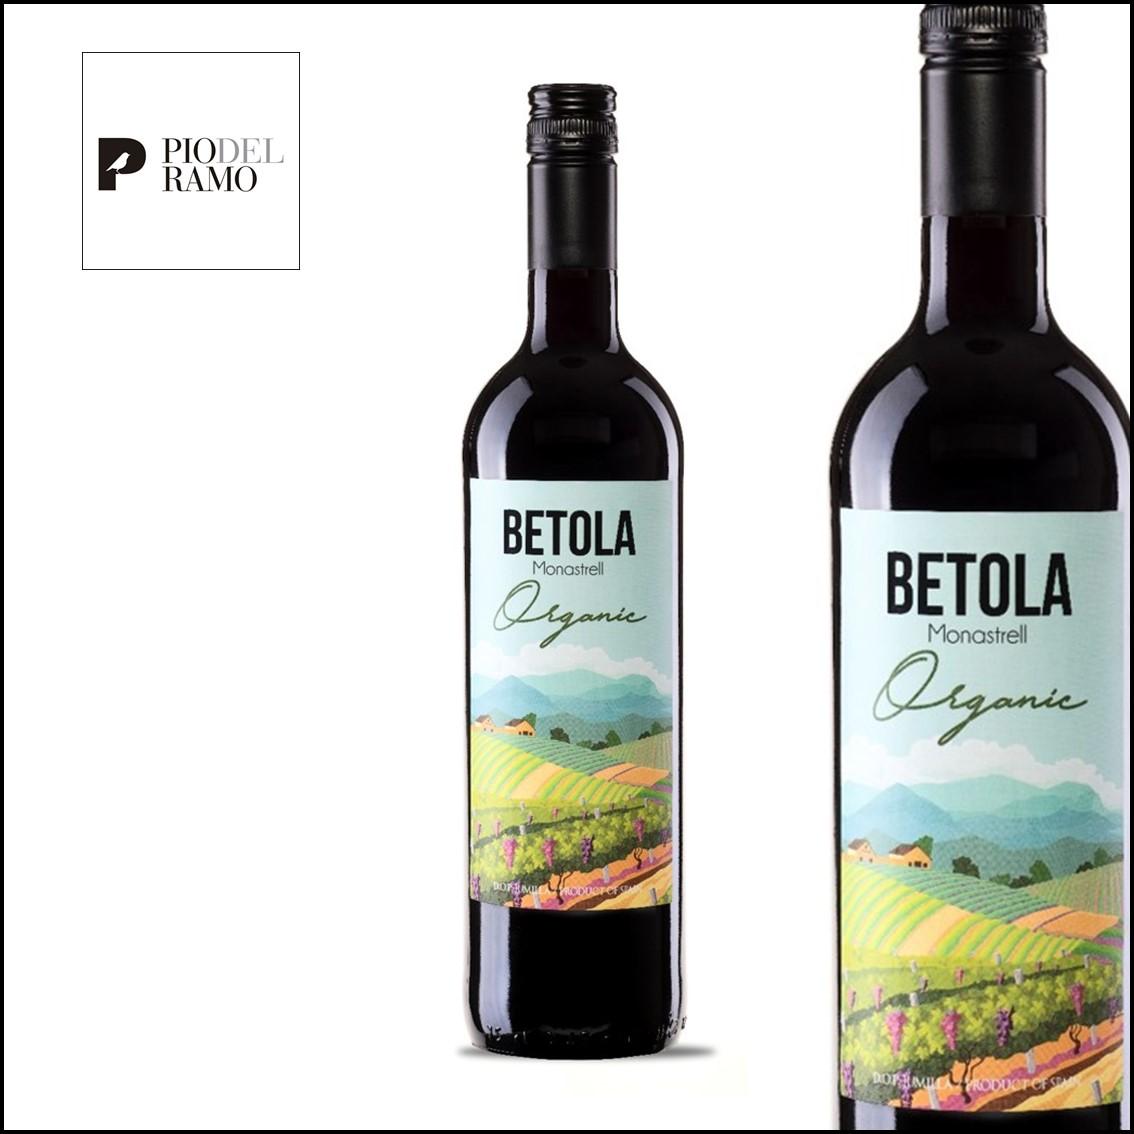 Pío del Ramo Betola Organic